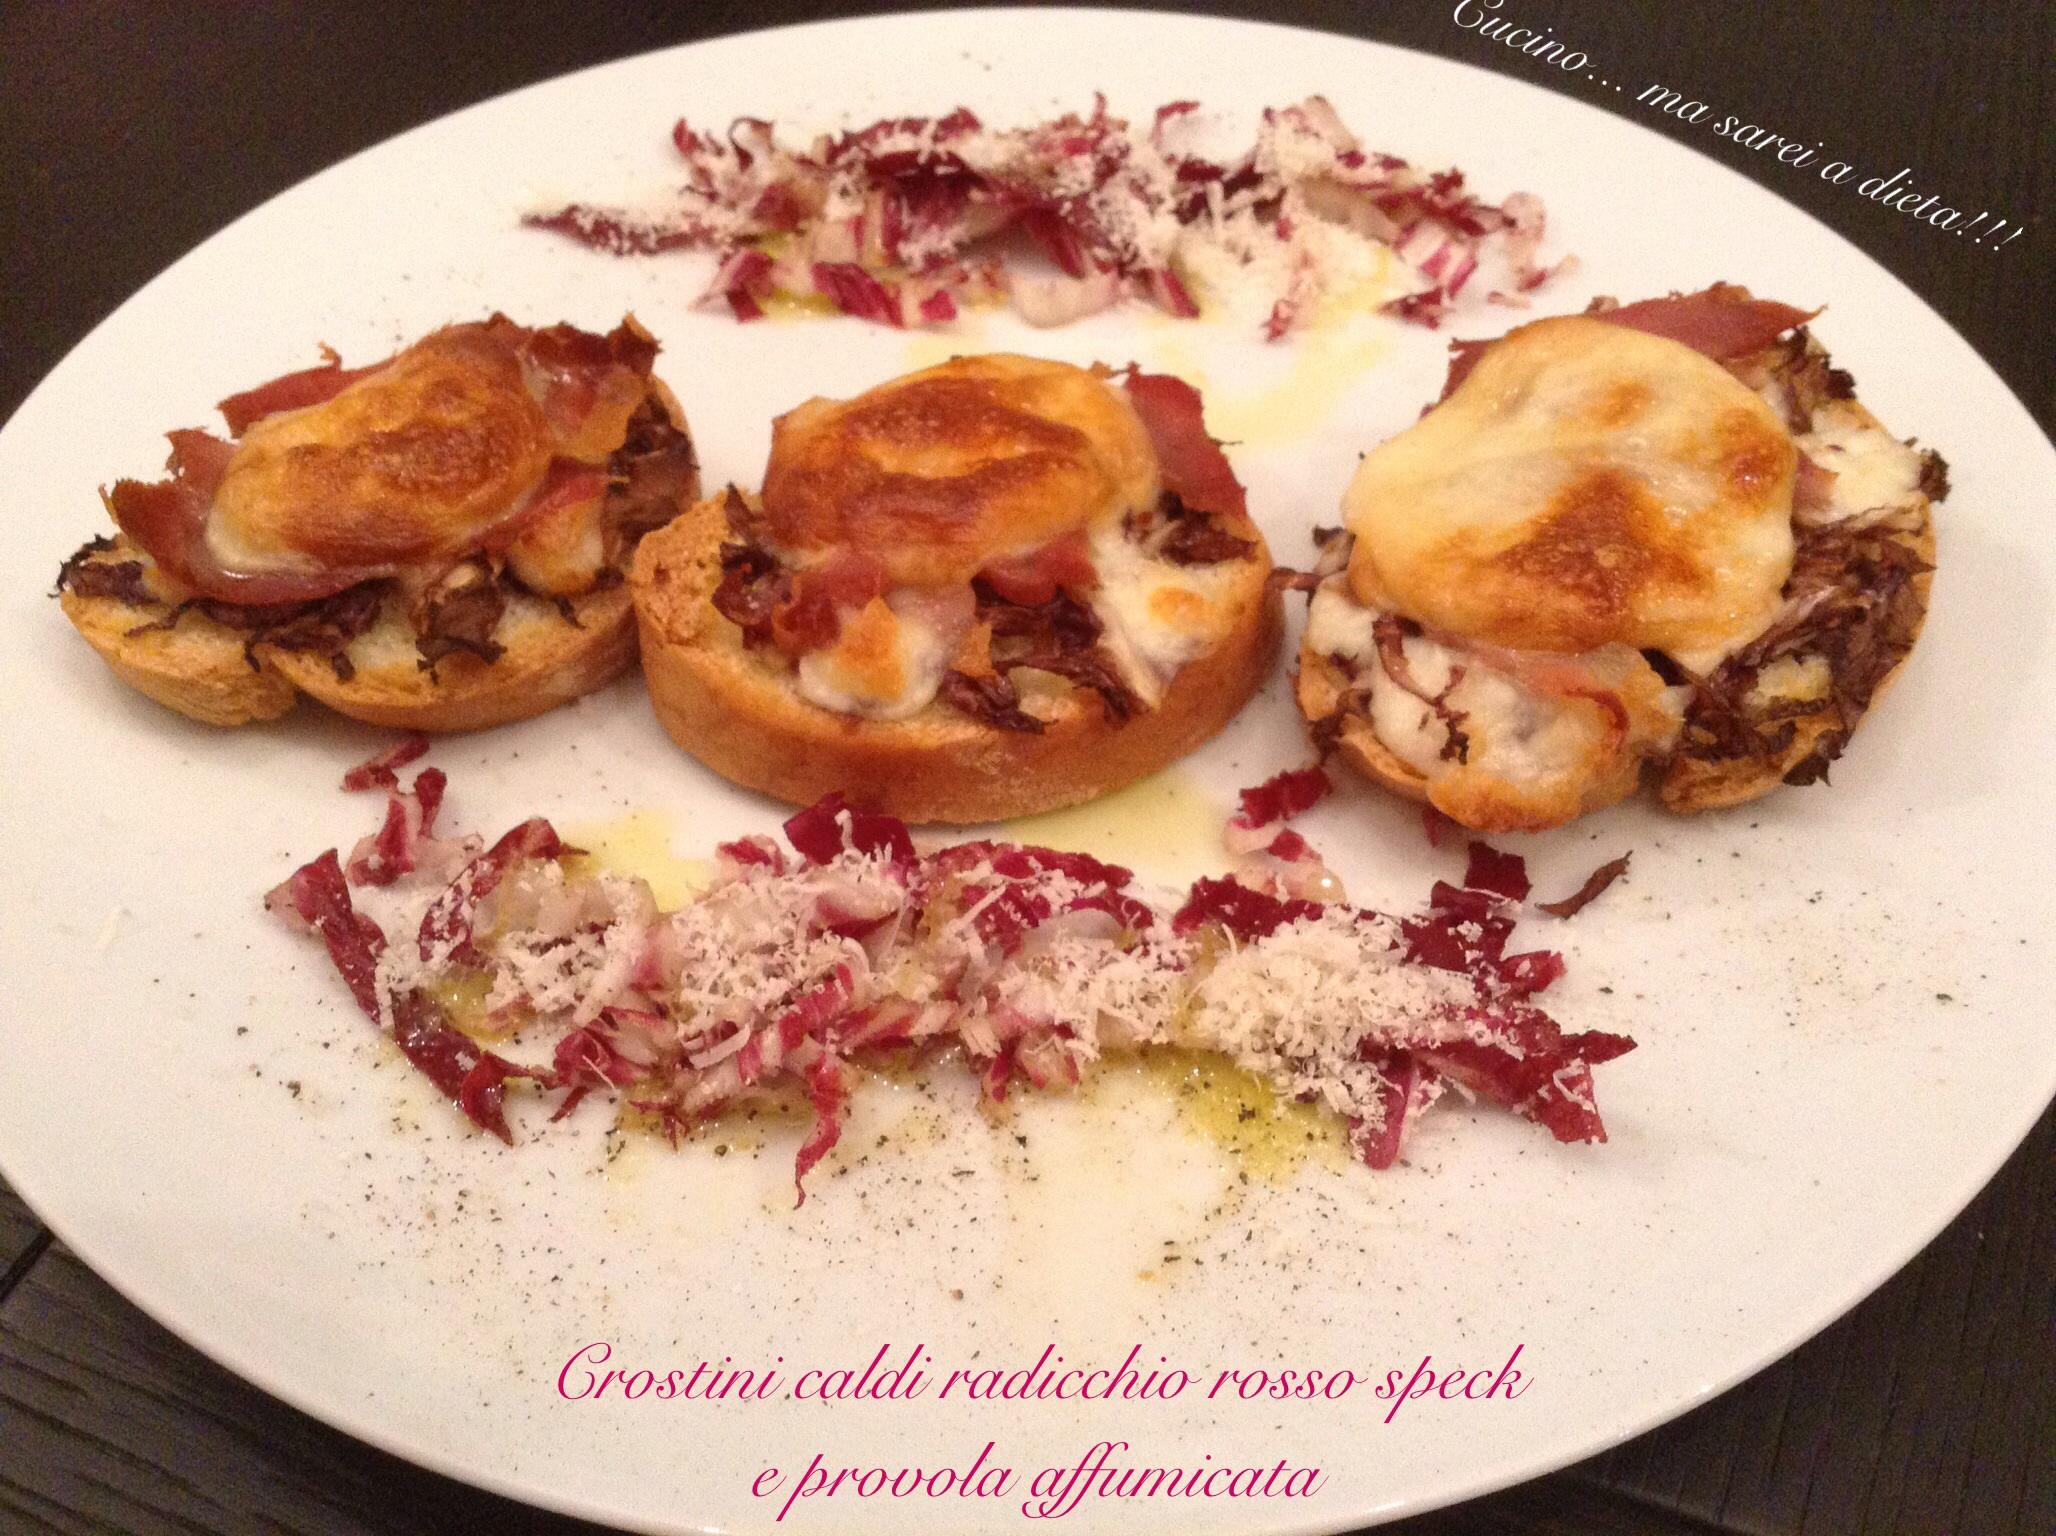 Crostini caldi con radicchio rosso